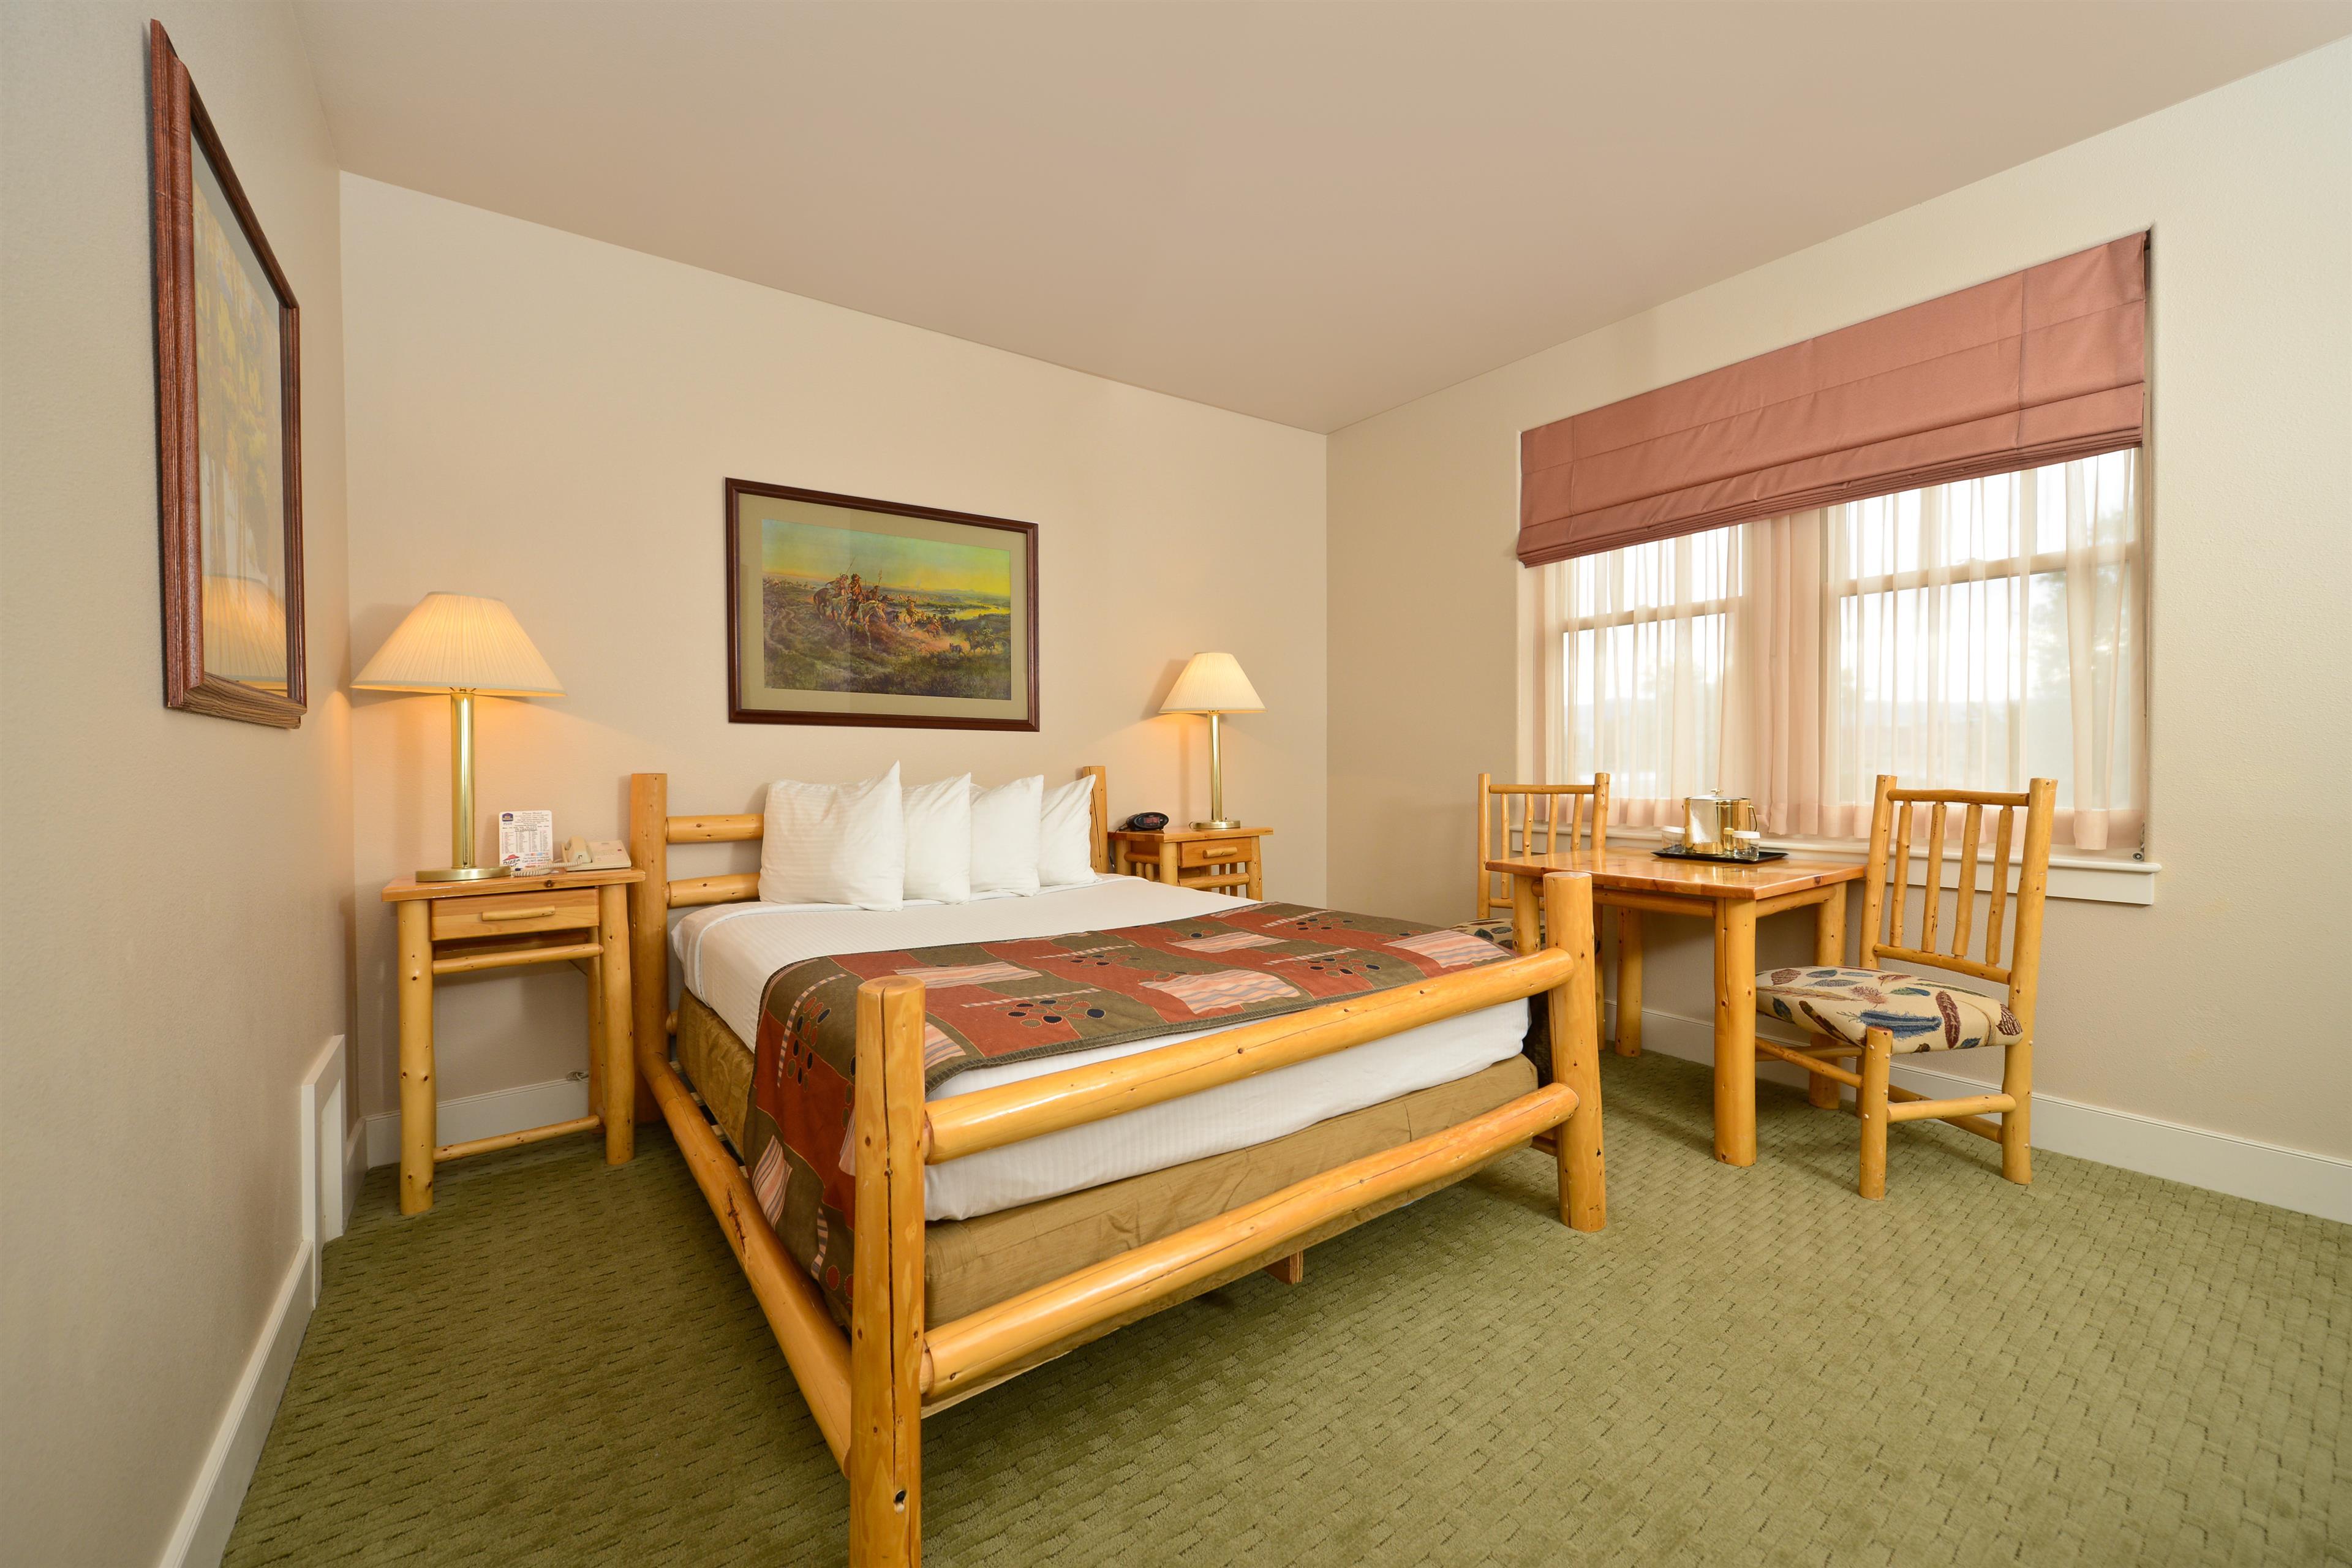 Best Western Plus Plaza Hotel image 24